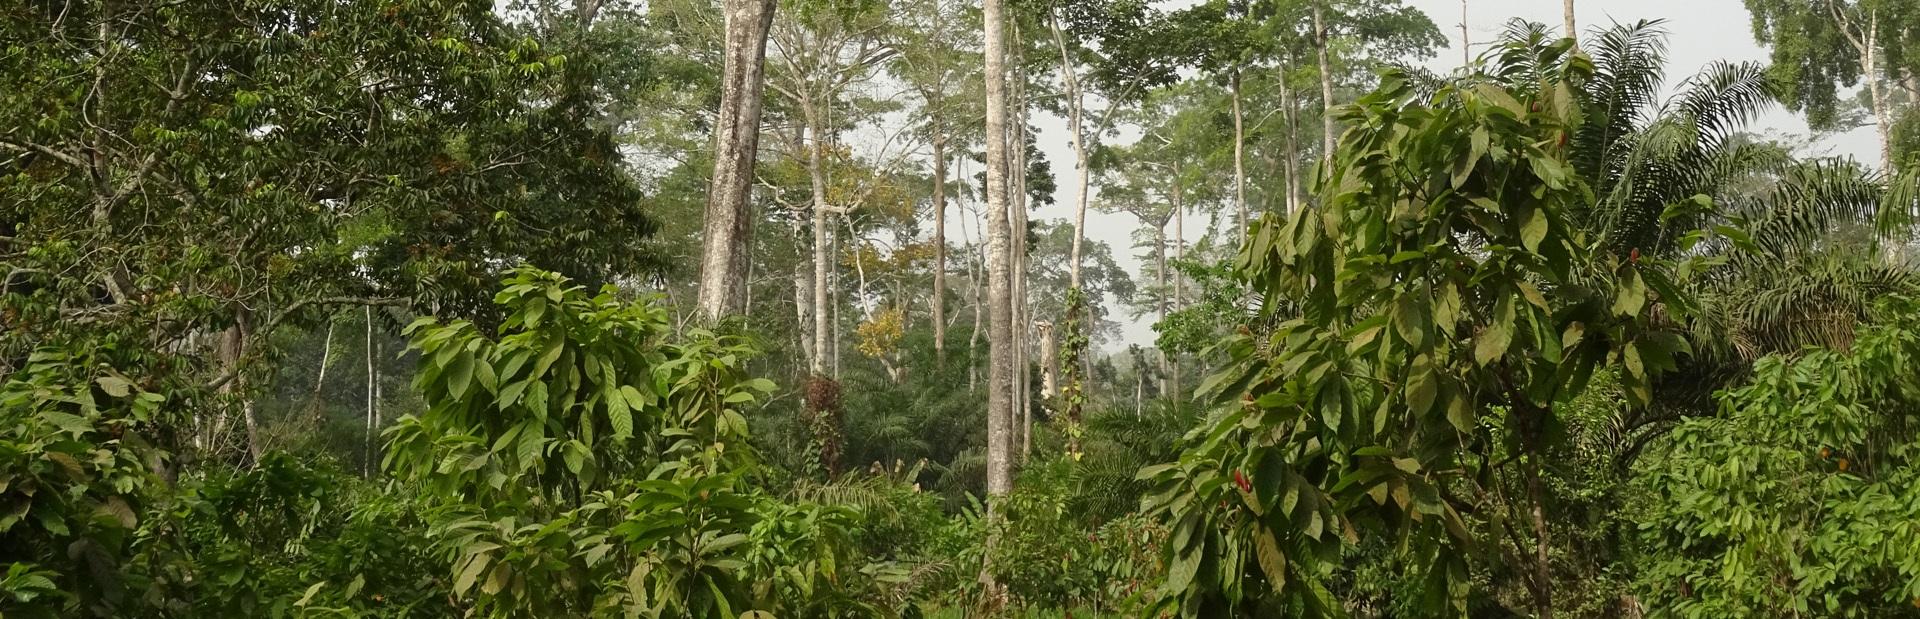 Energy Biomass Sourcing